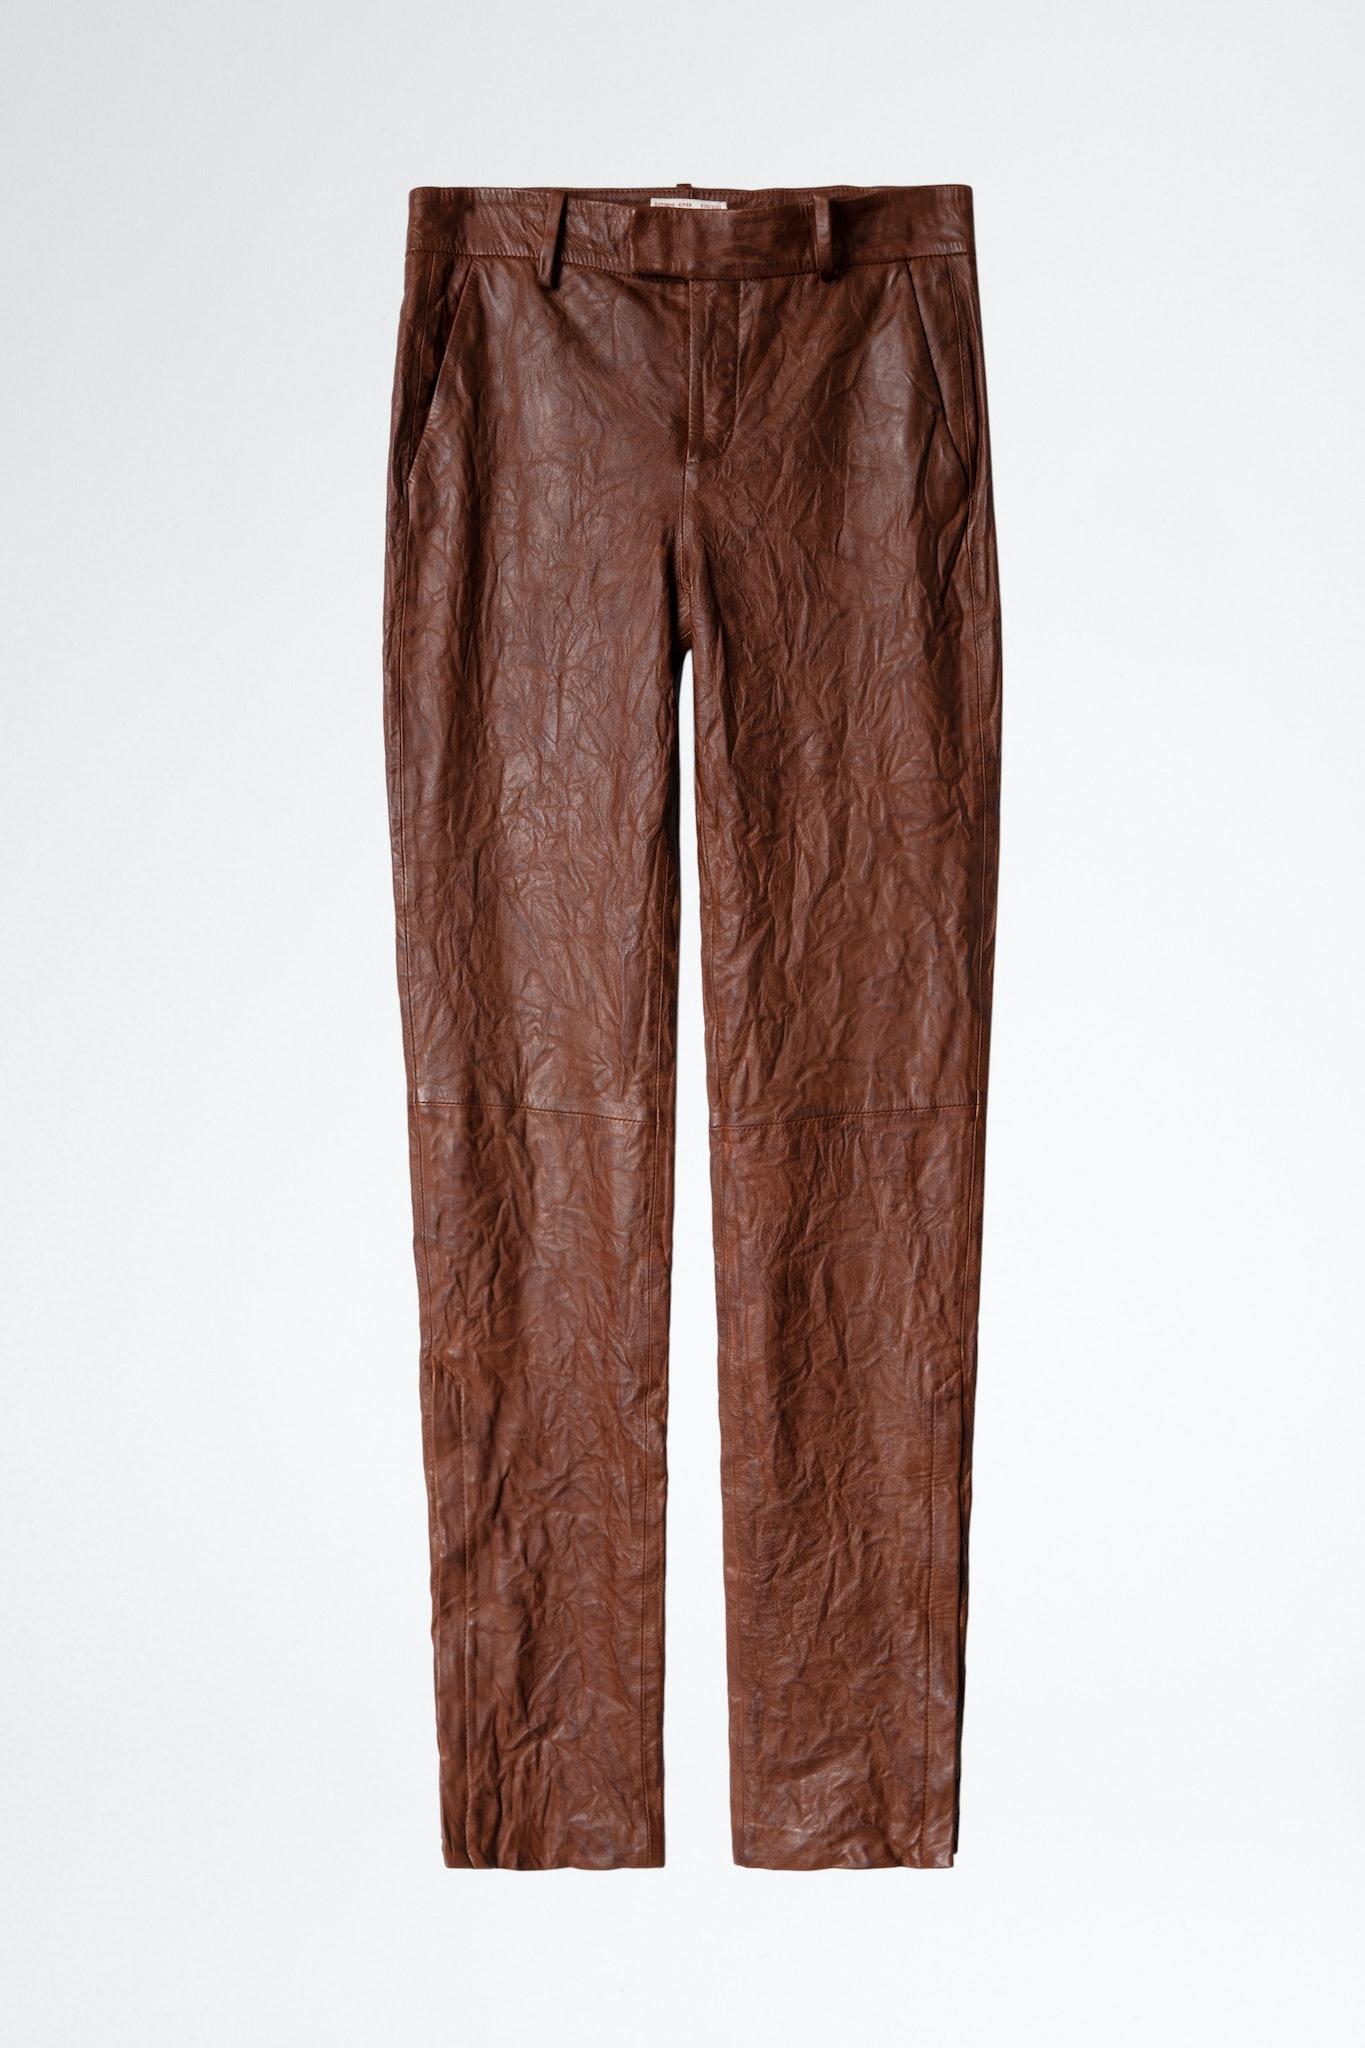 Prune Trousers